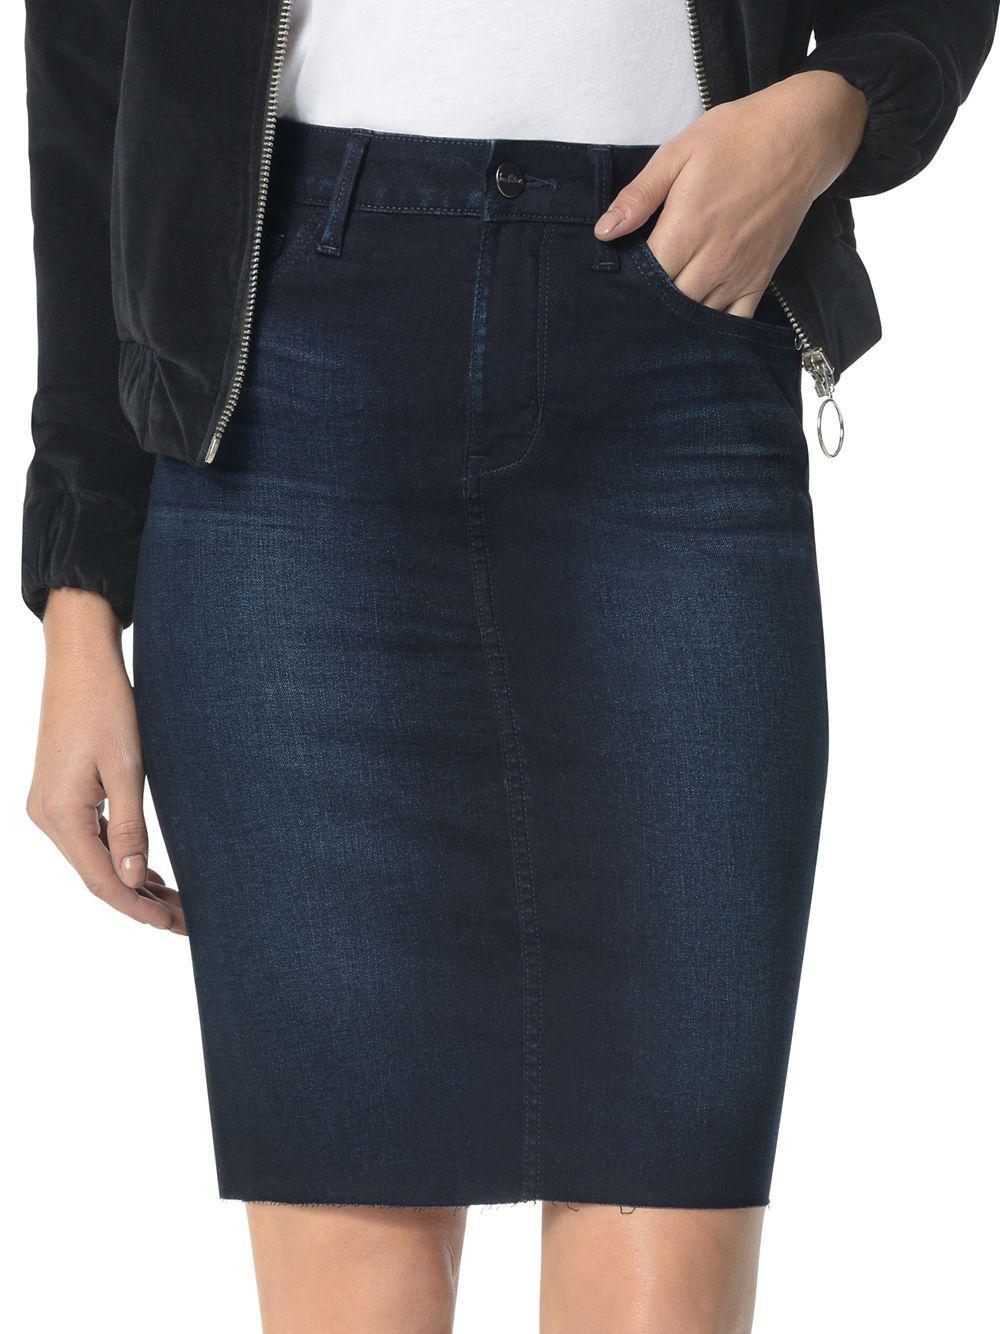 f1d214d68 Sam Edelman The Riley Denim Pencil Skirt in Blue - Lyst